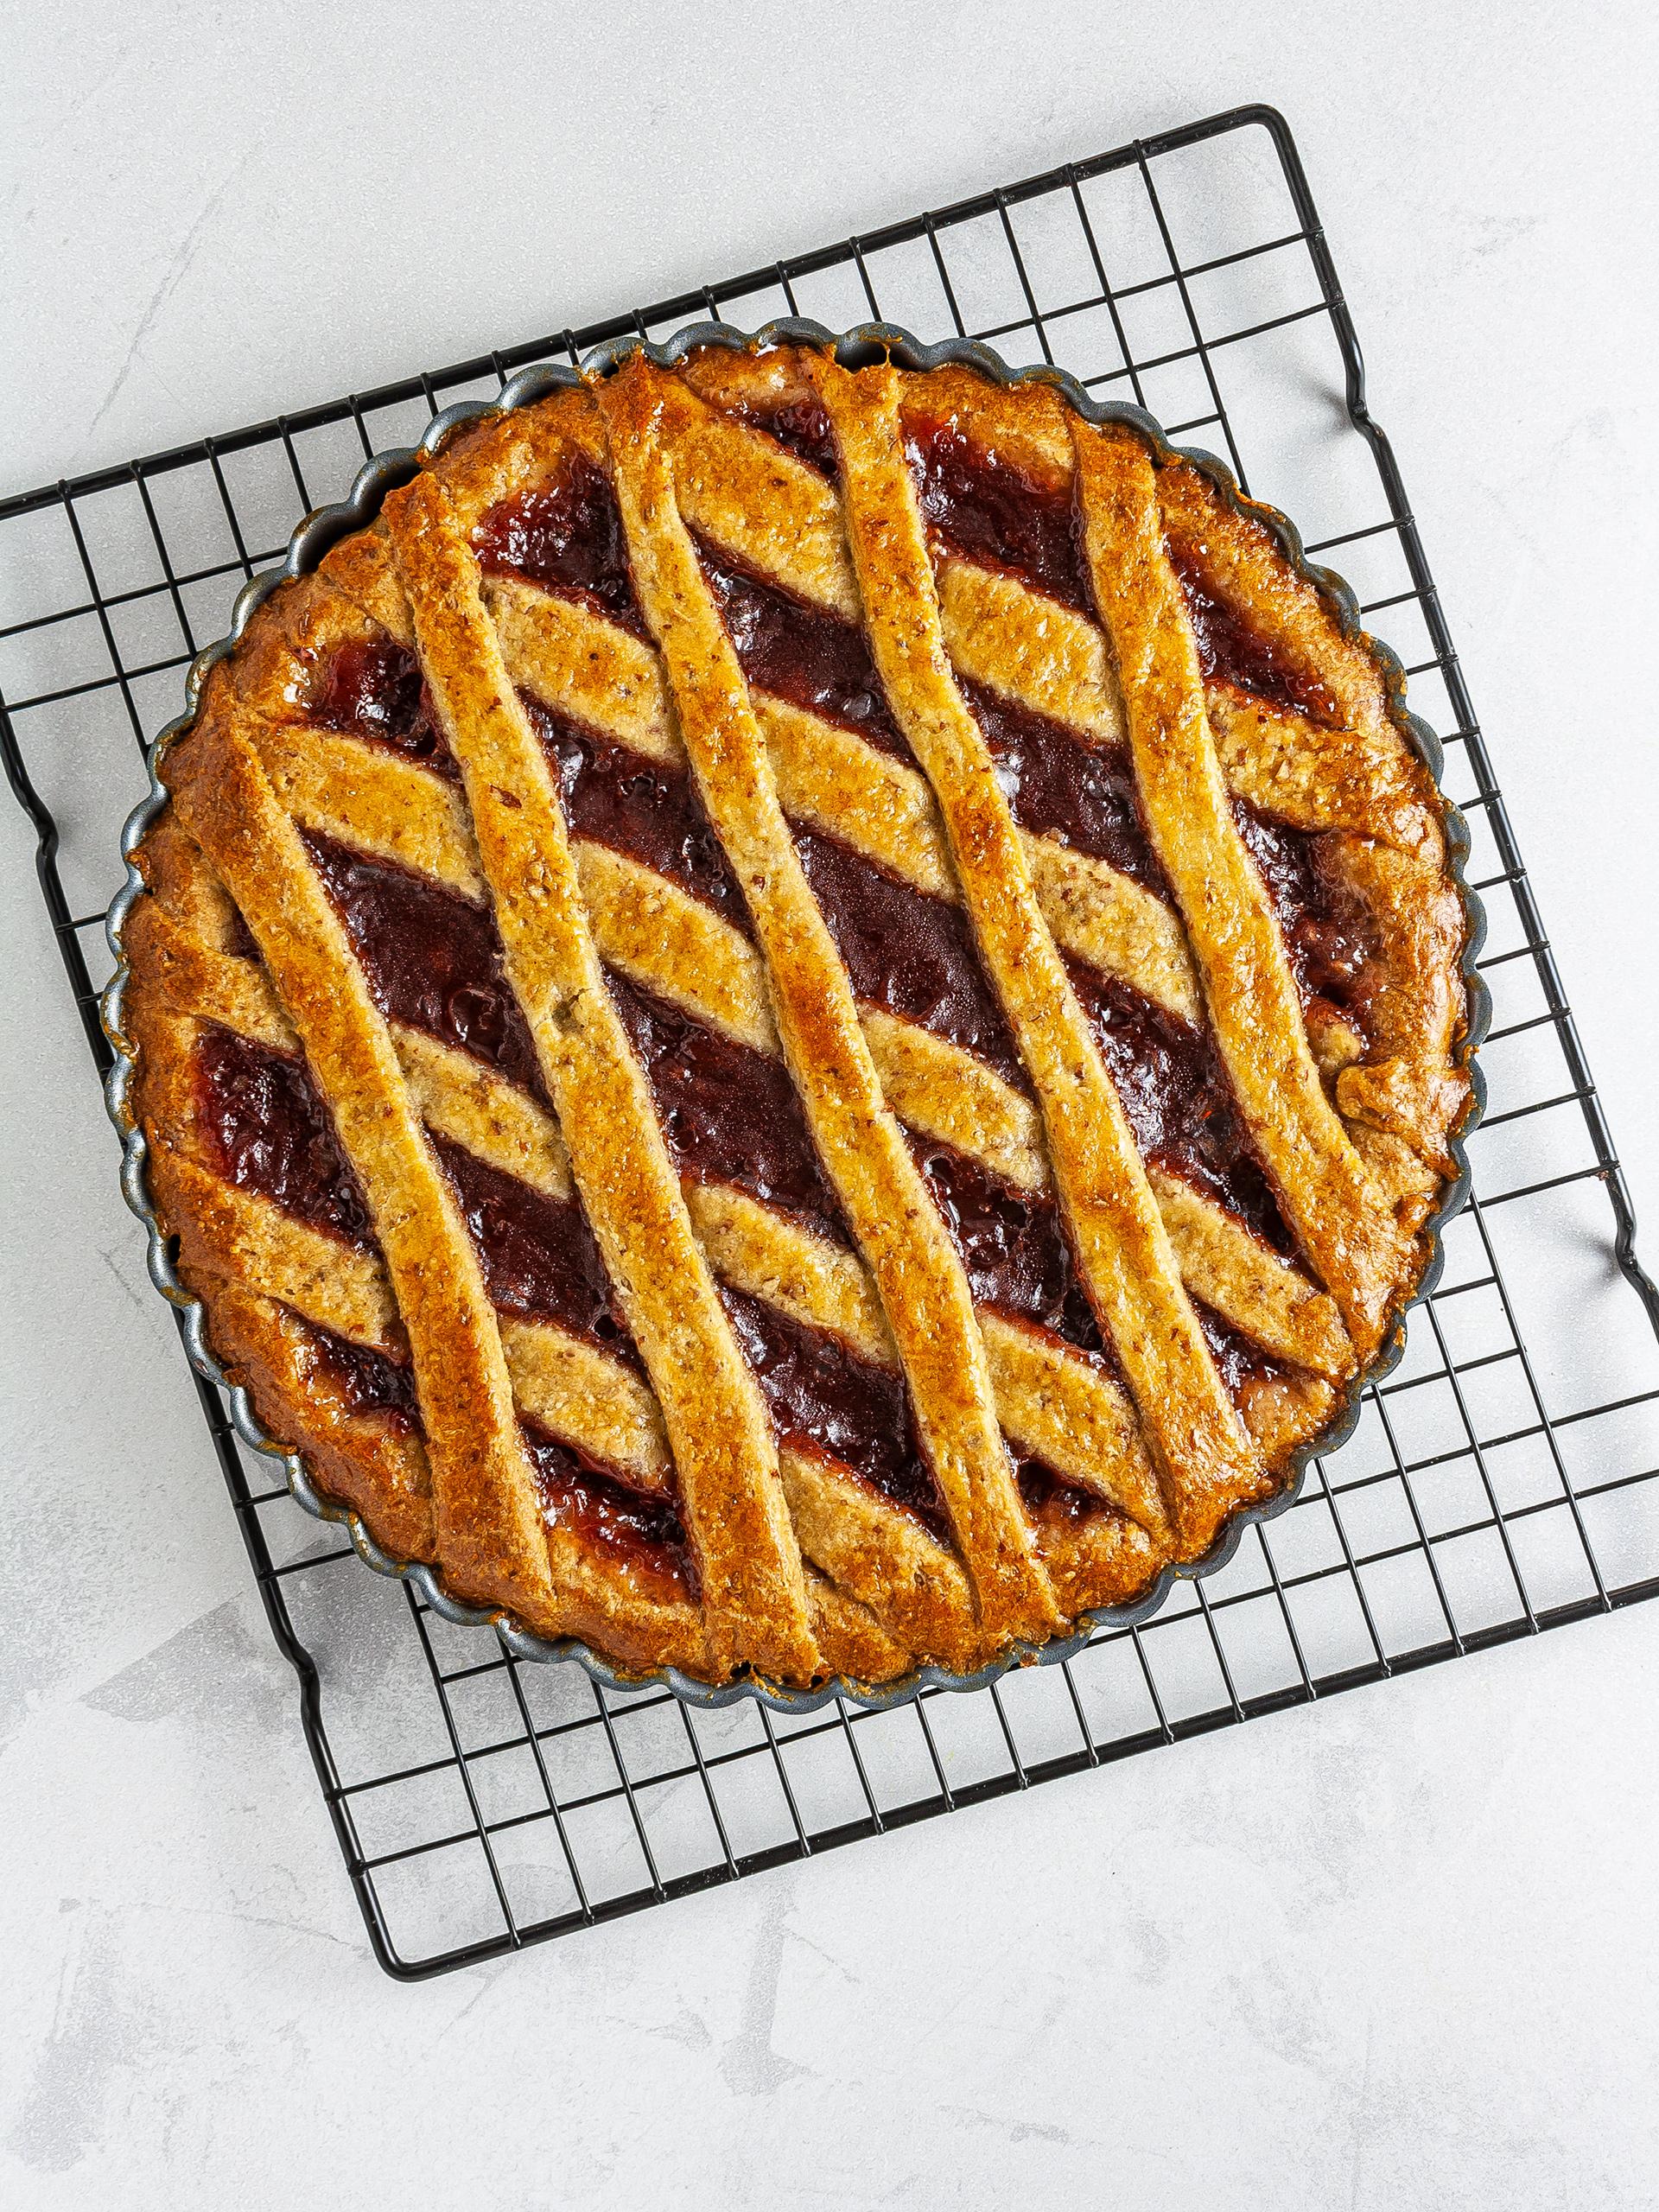 Baked strawberry jam pie